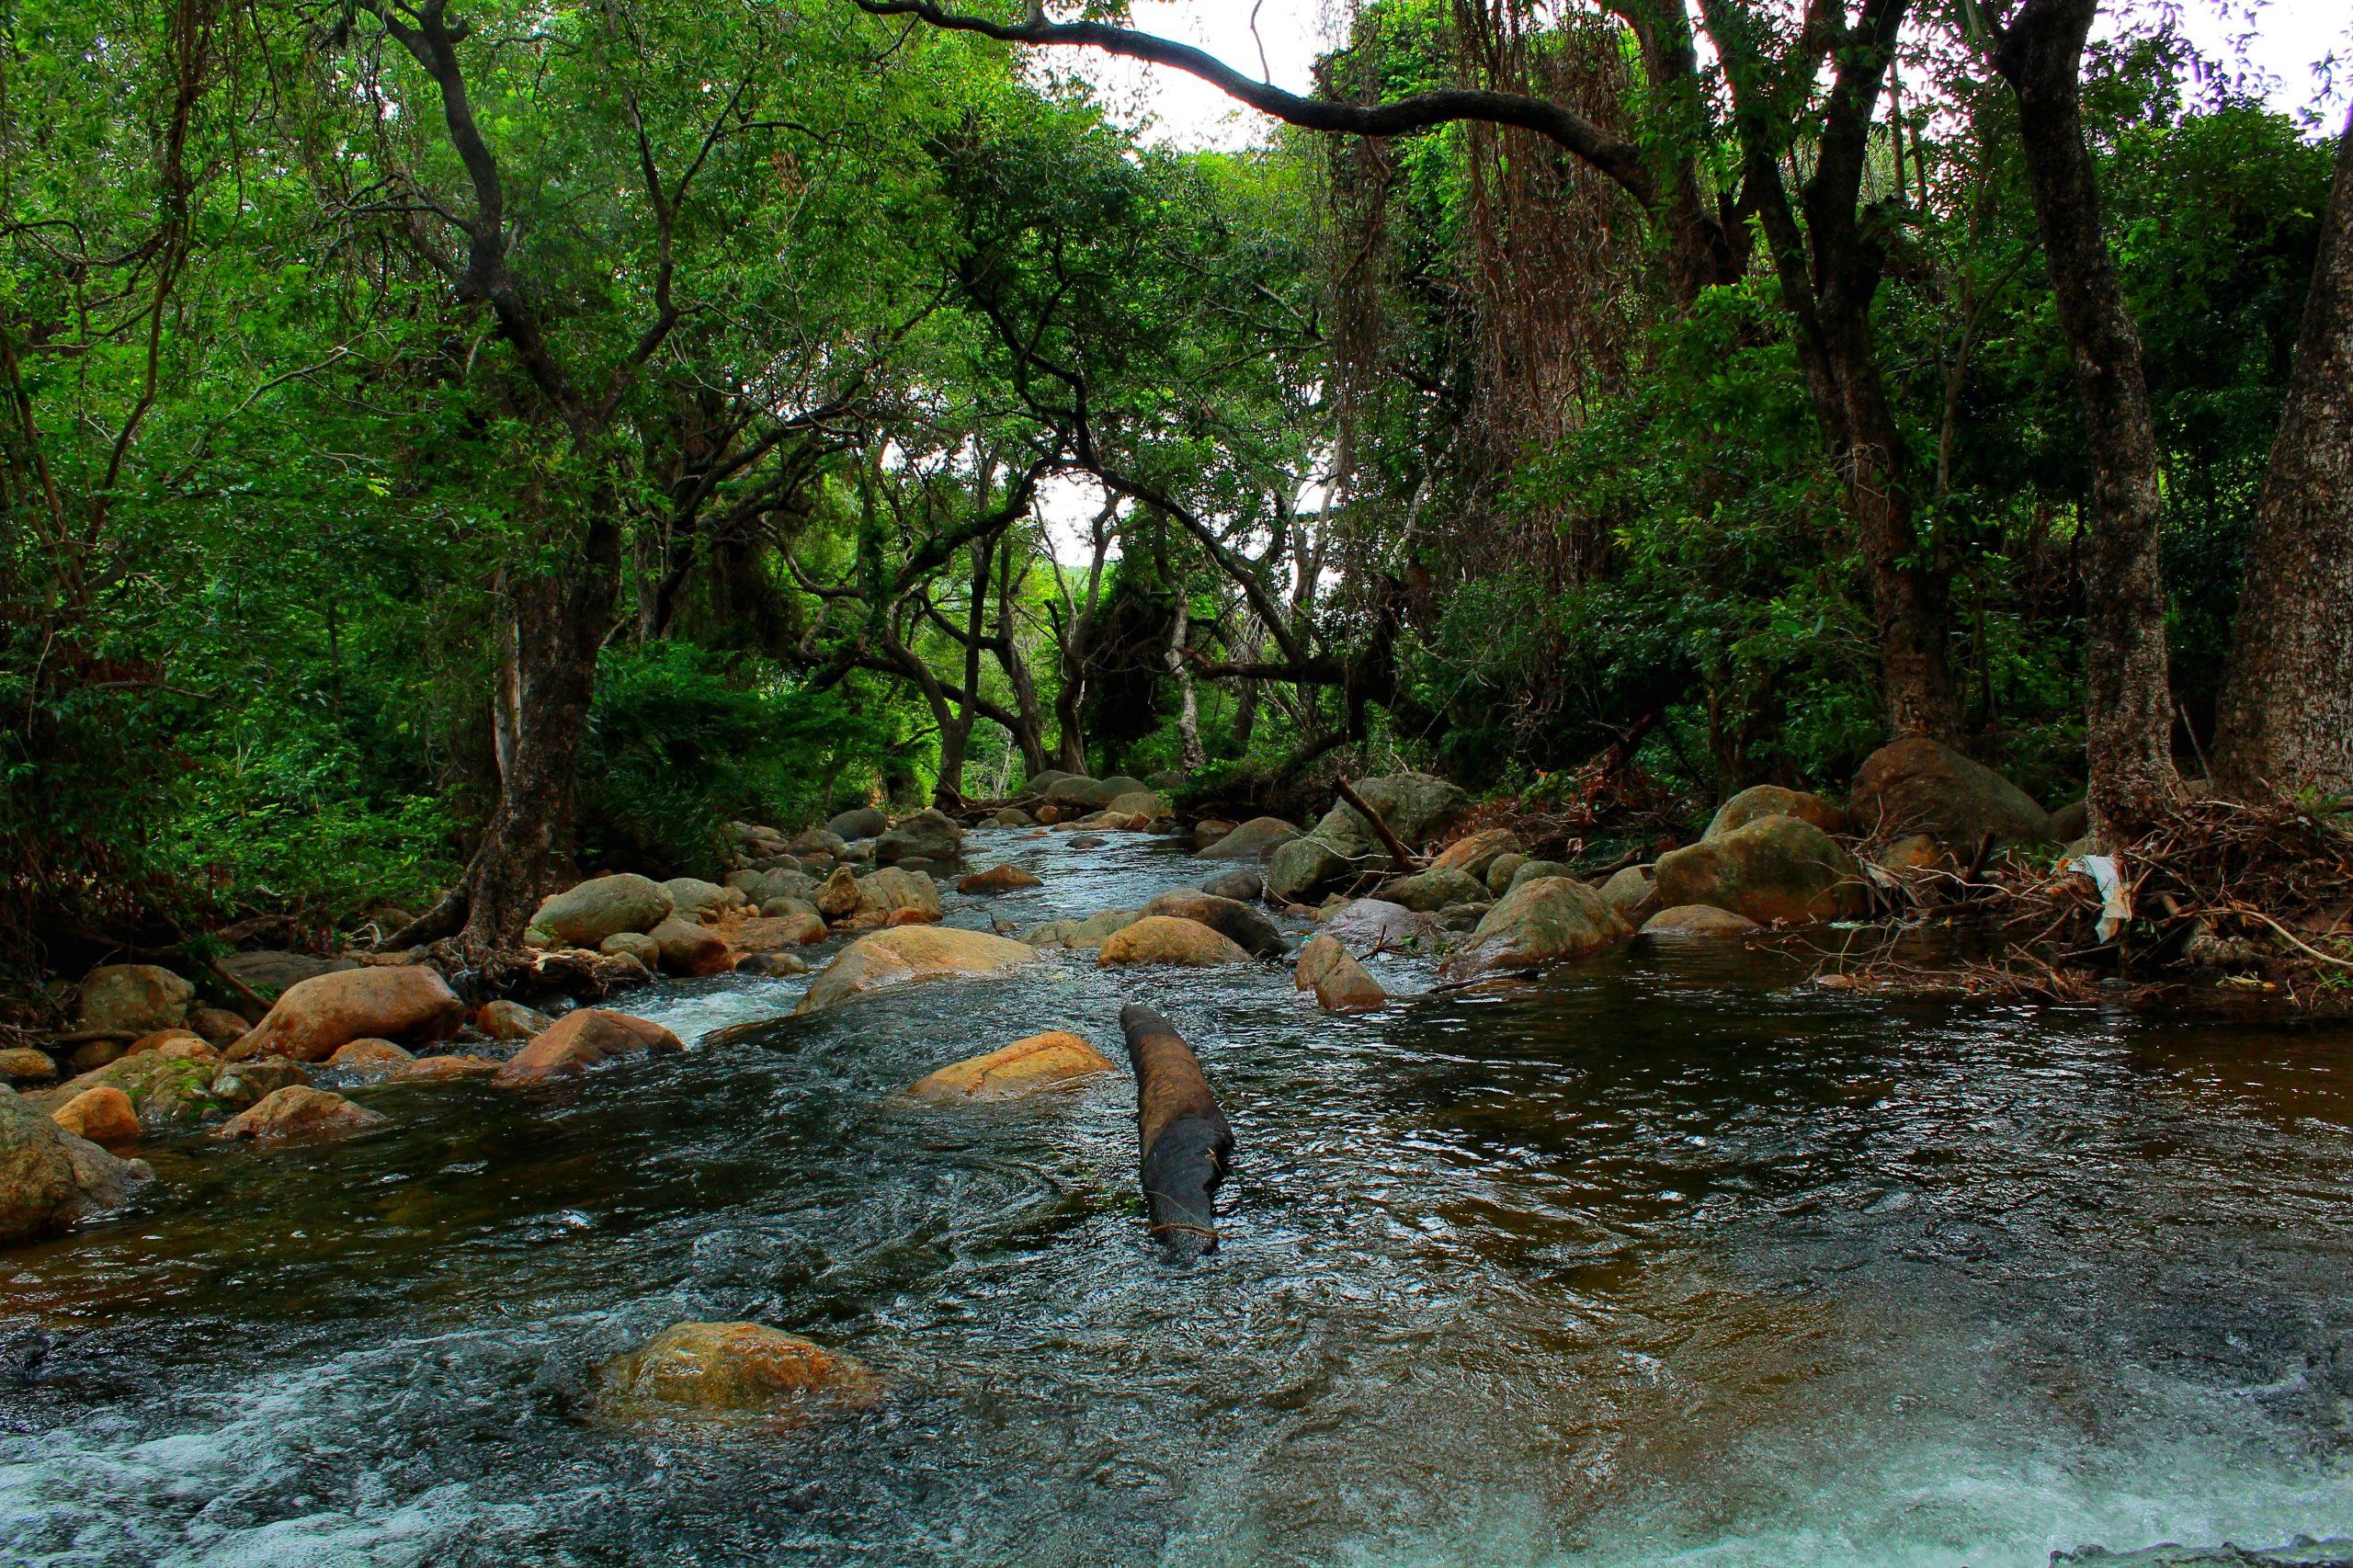 A river flowing through a jungle